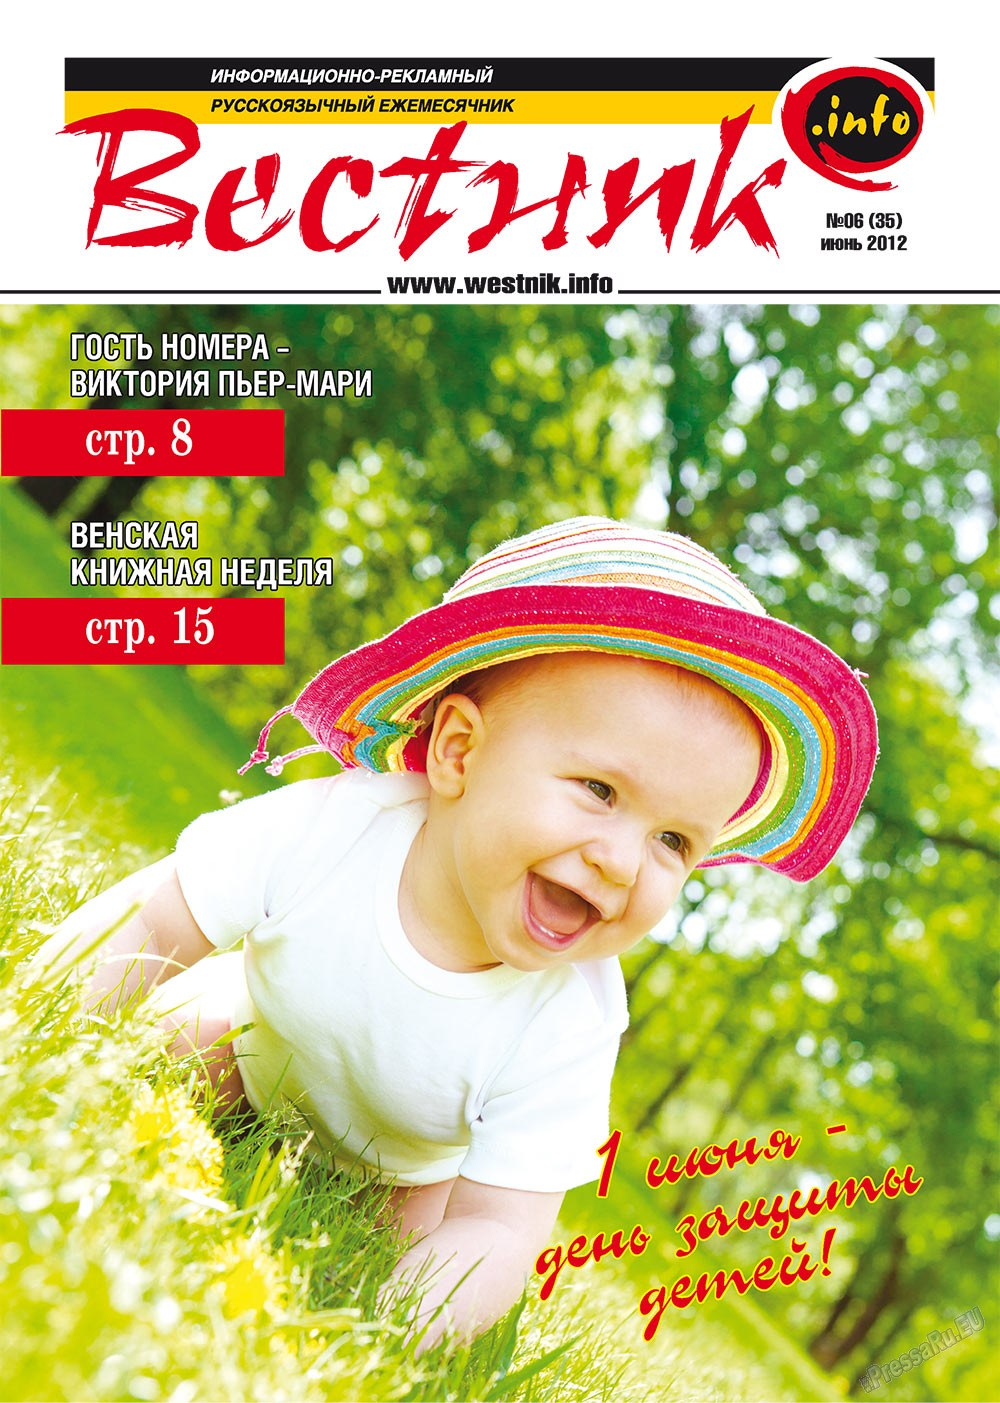 Вестник-info (журнал). 2012 год, номер 6, стр. 1